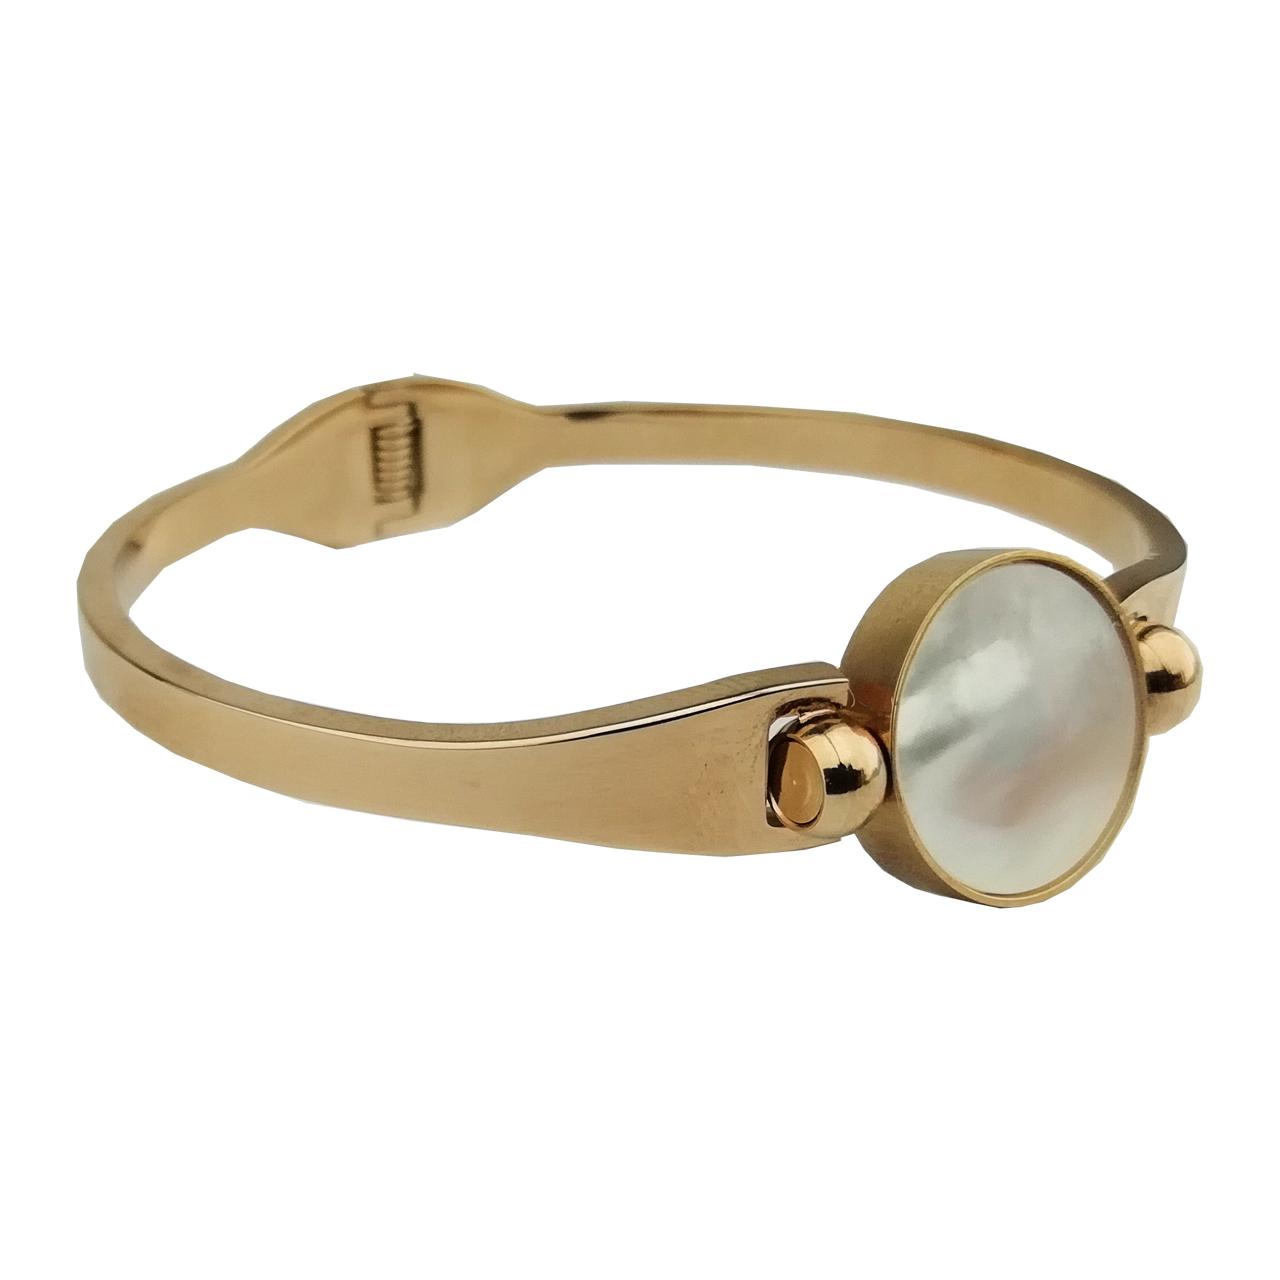 دستبند النگويي دوحالته كد 180050 تک سایز